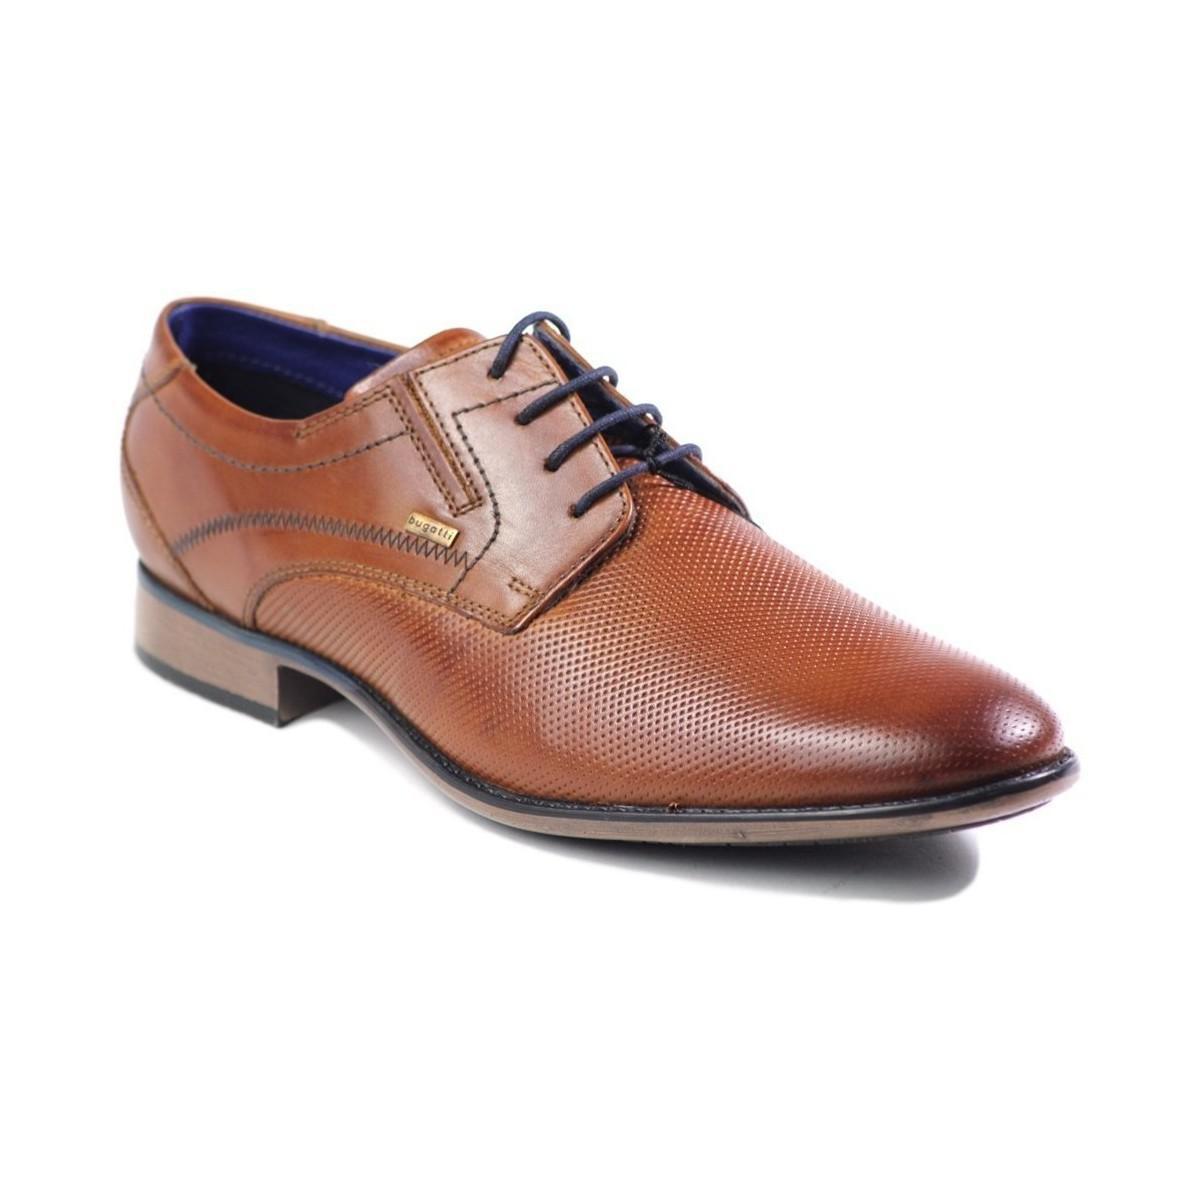 Bugatti 3112530521006300 Men s Smart Formal Shoes In Brown